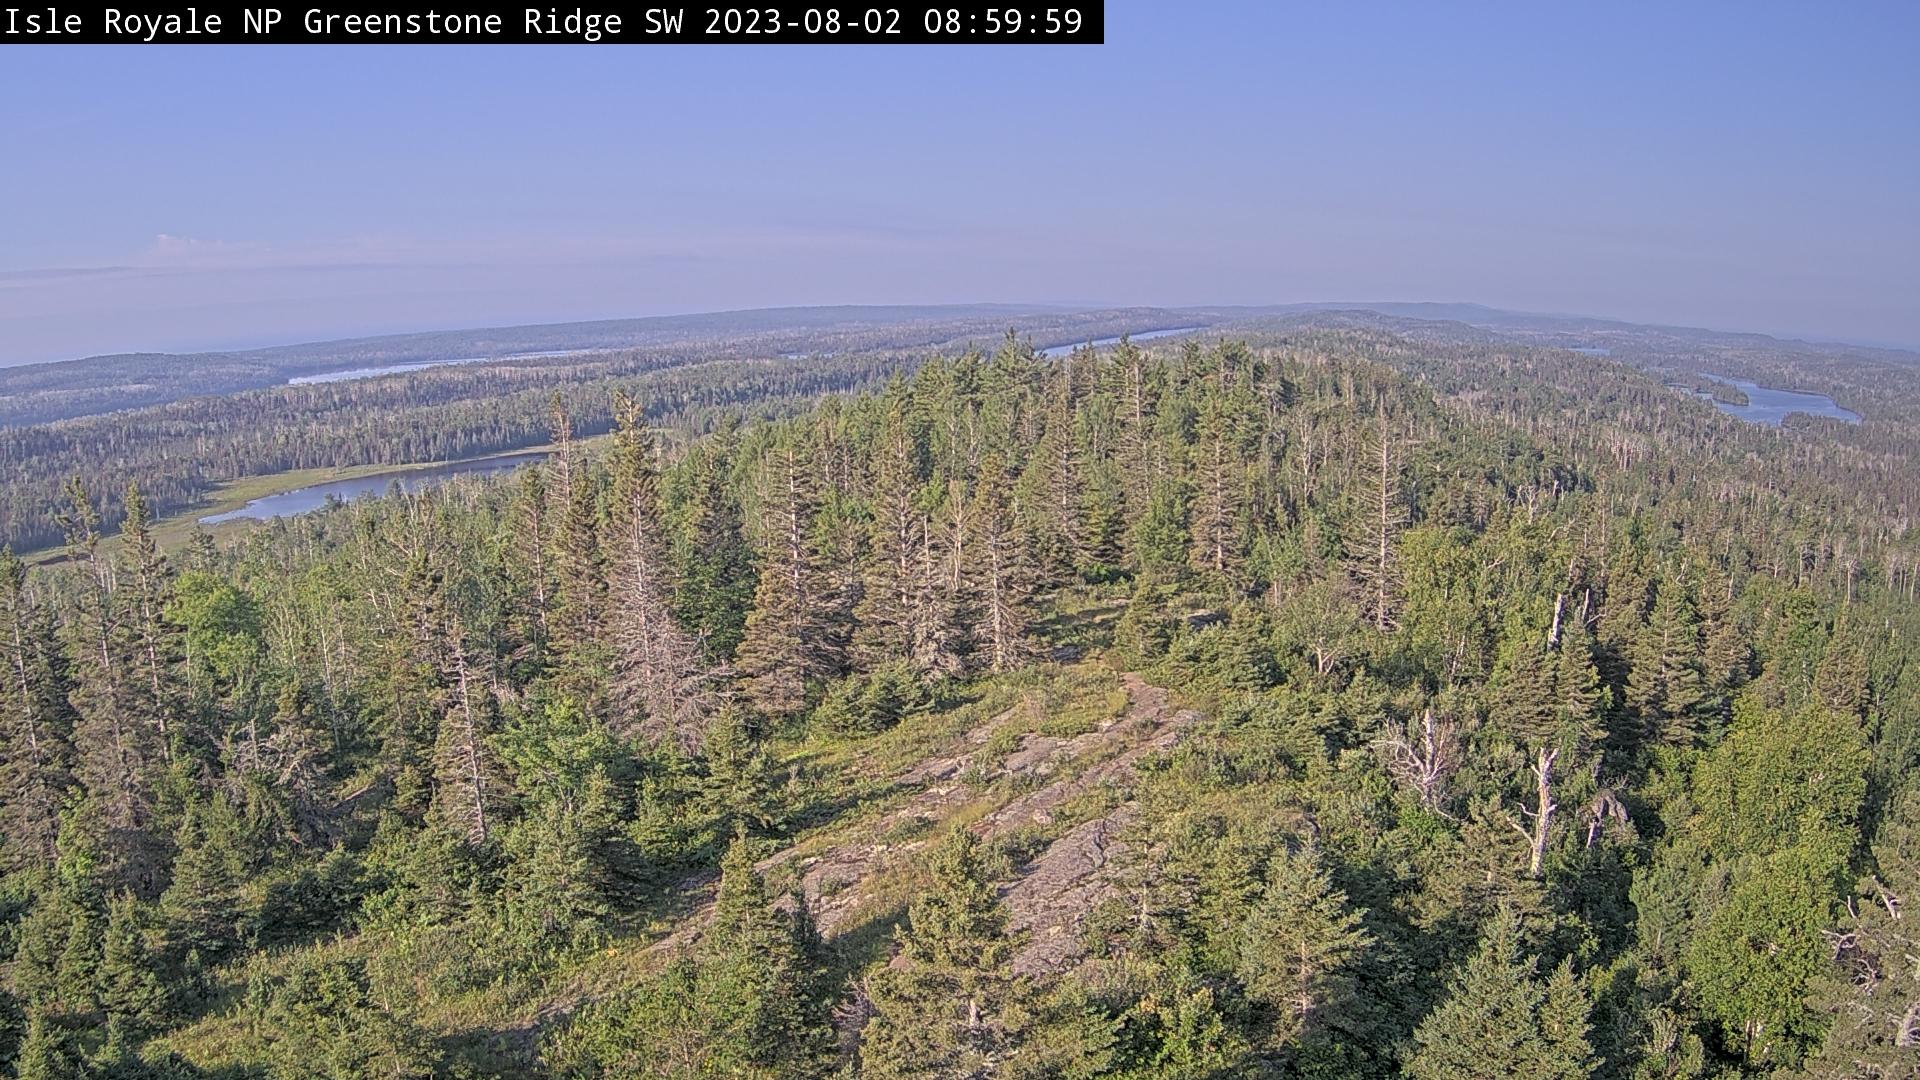 Greenstone Ridge Webcam preview image